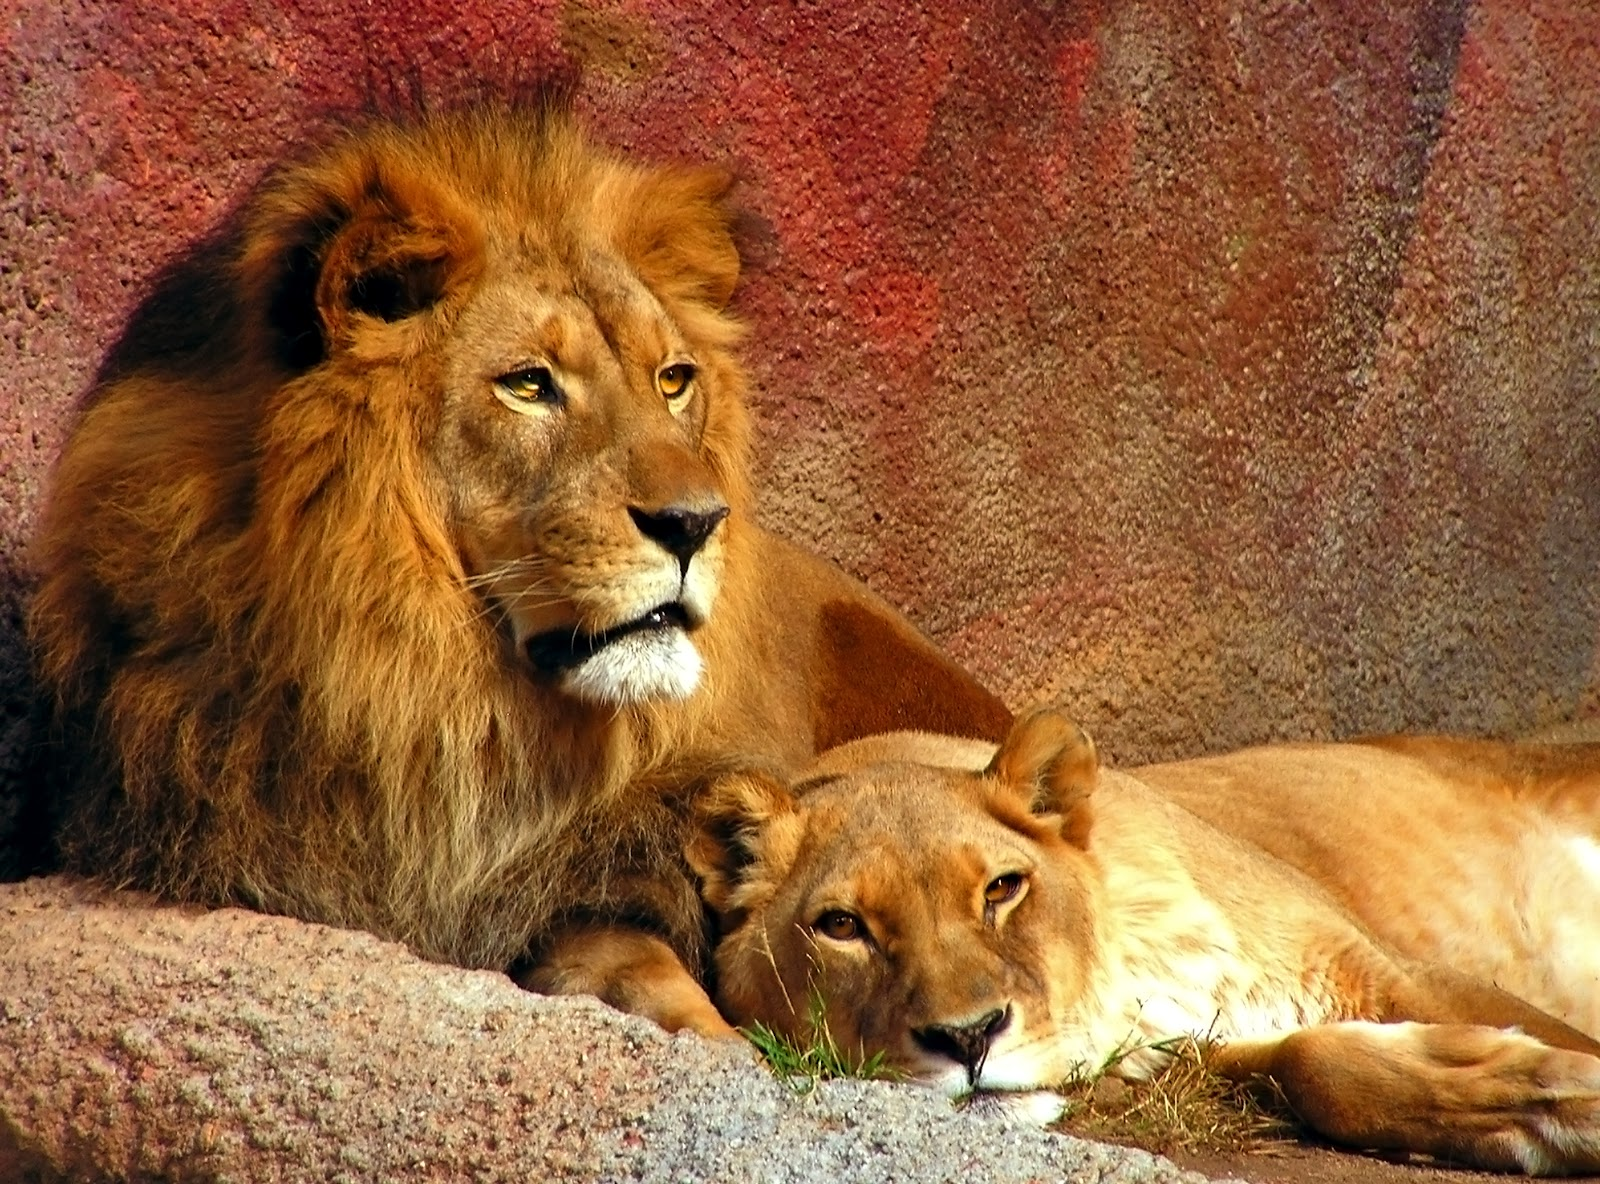 Beautiful Animals Safaris: Amazing Lions: Big Cats Africa ...